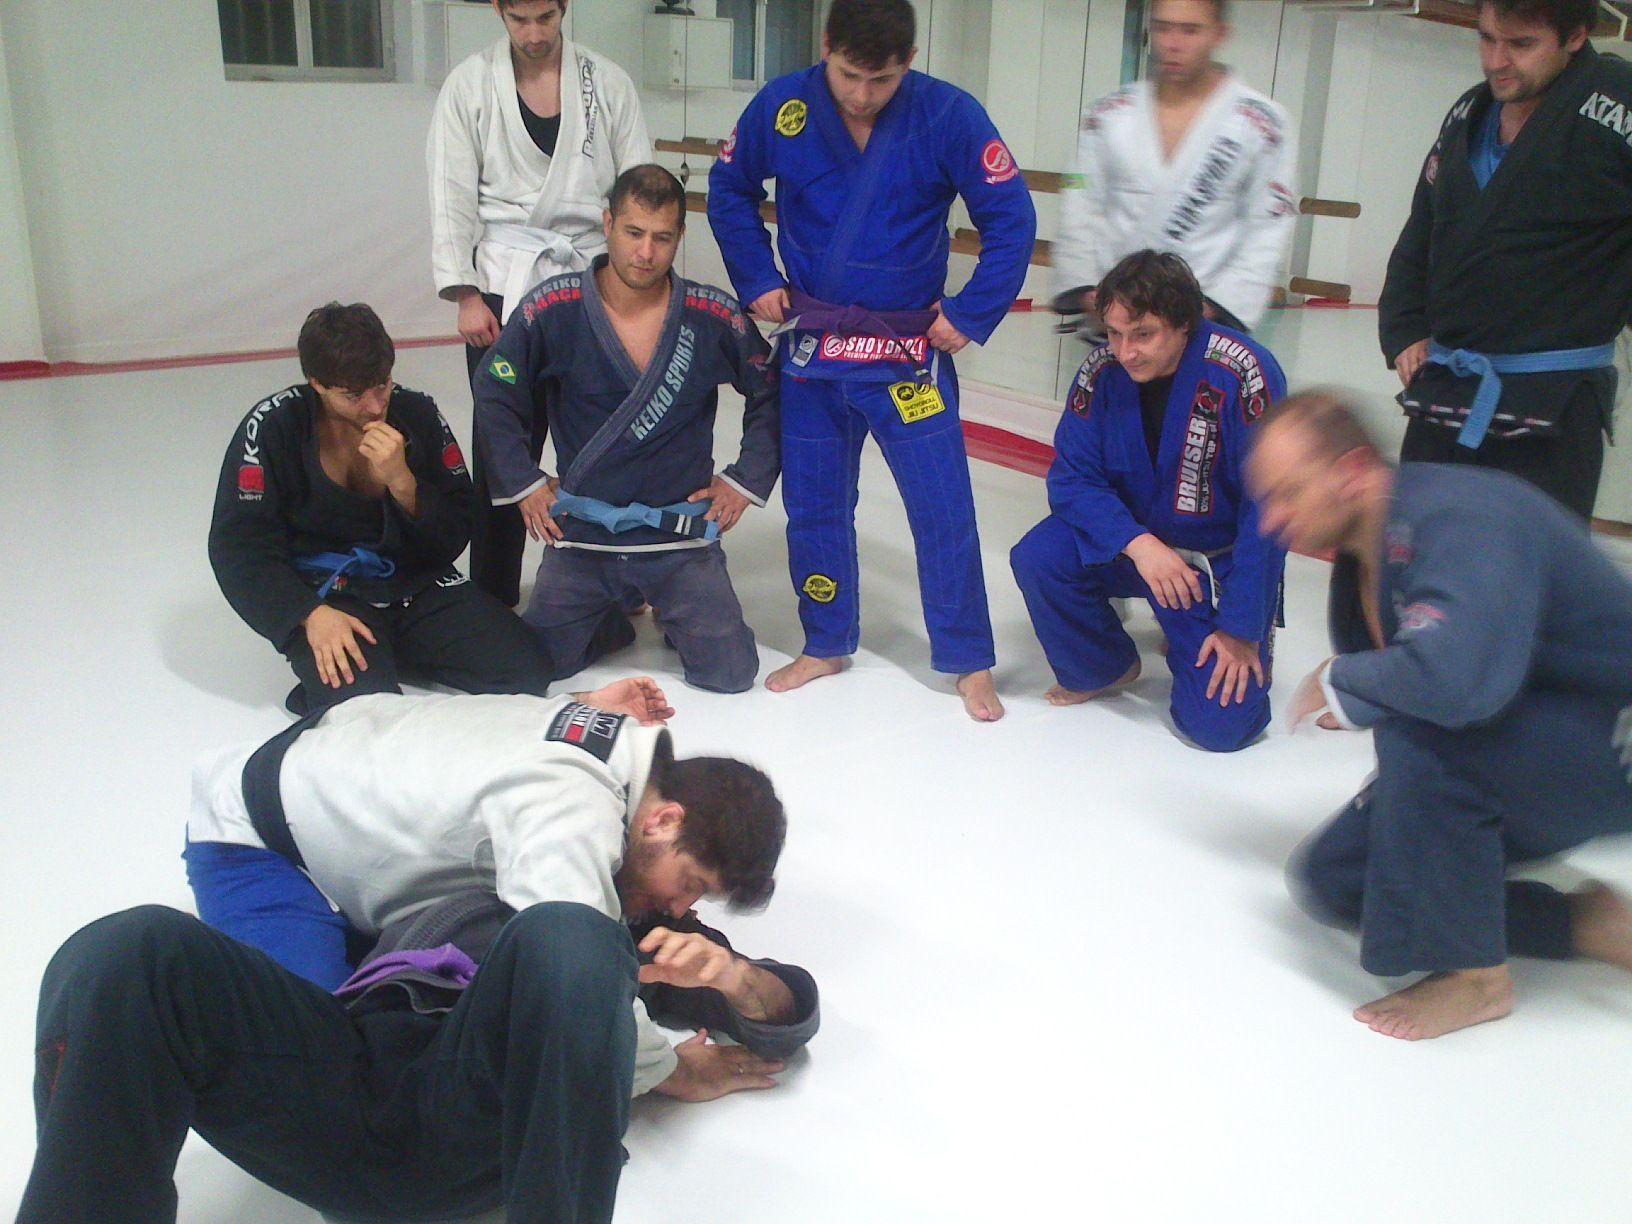 Estructura de una clase en Checkmat Bjj Madrid